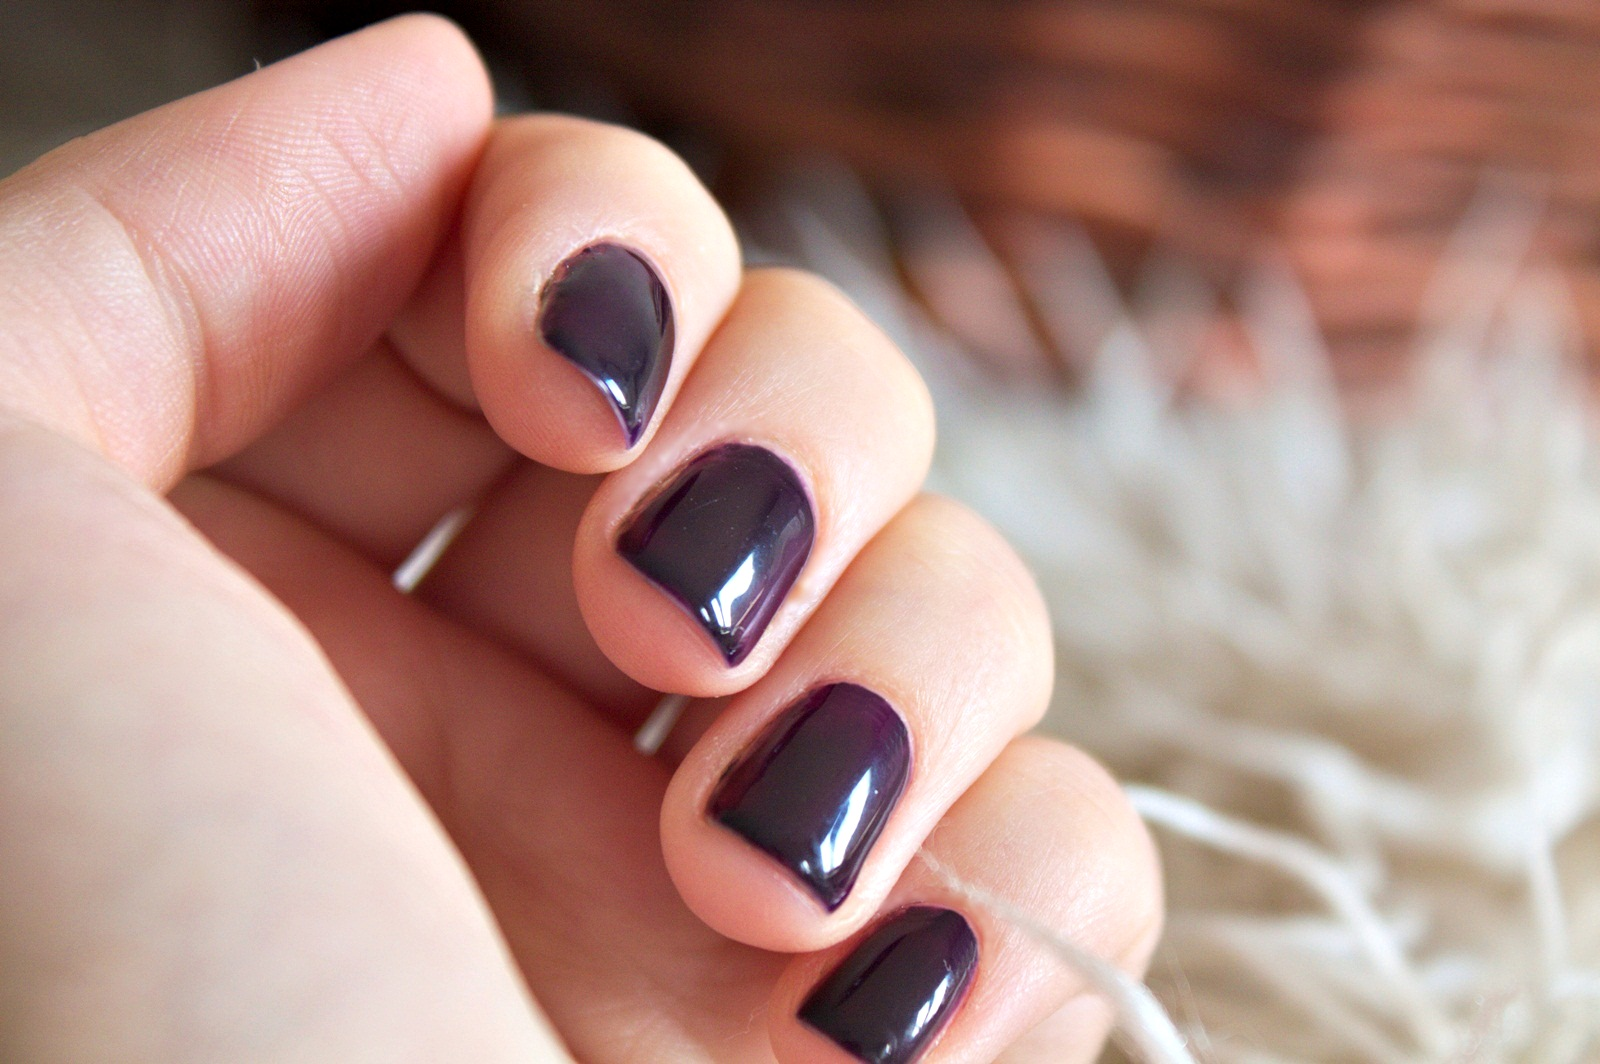 Lakier hybrydowy Semilac Black Purple 100 na paznokciach